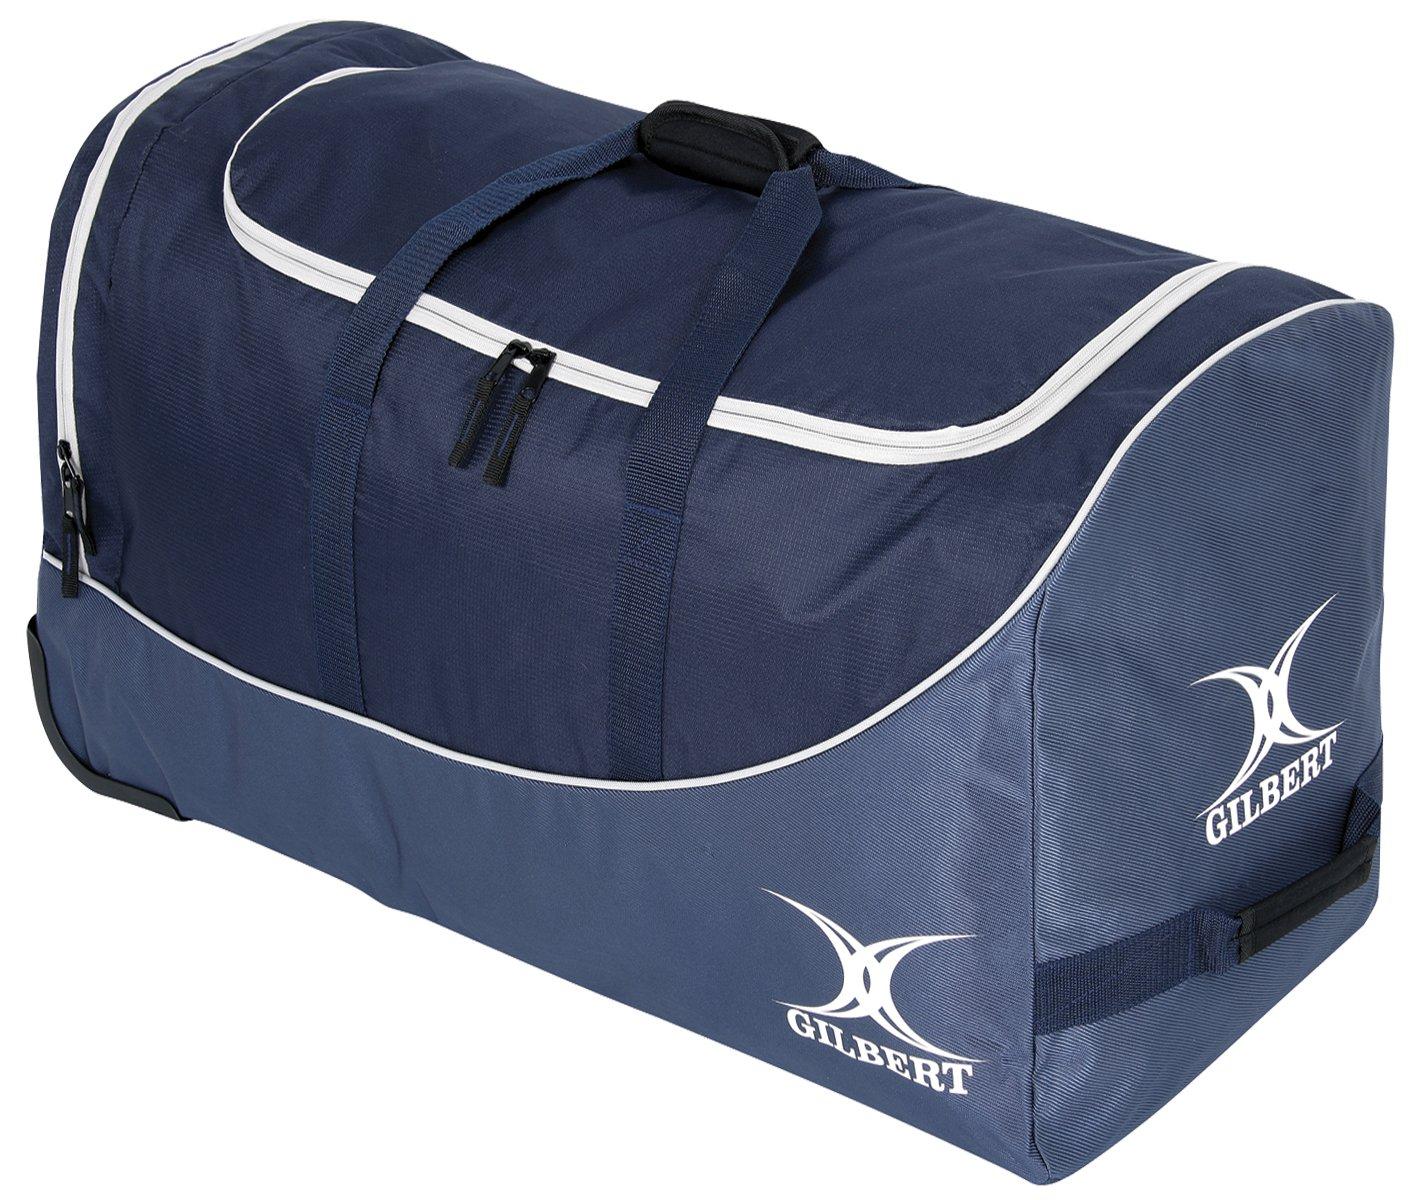 Gilbert Club - Bolsa para material de rugby, color azul/azul marino